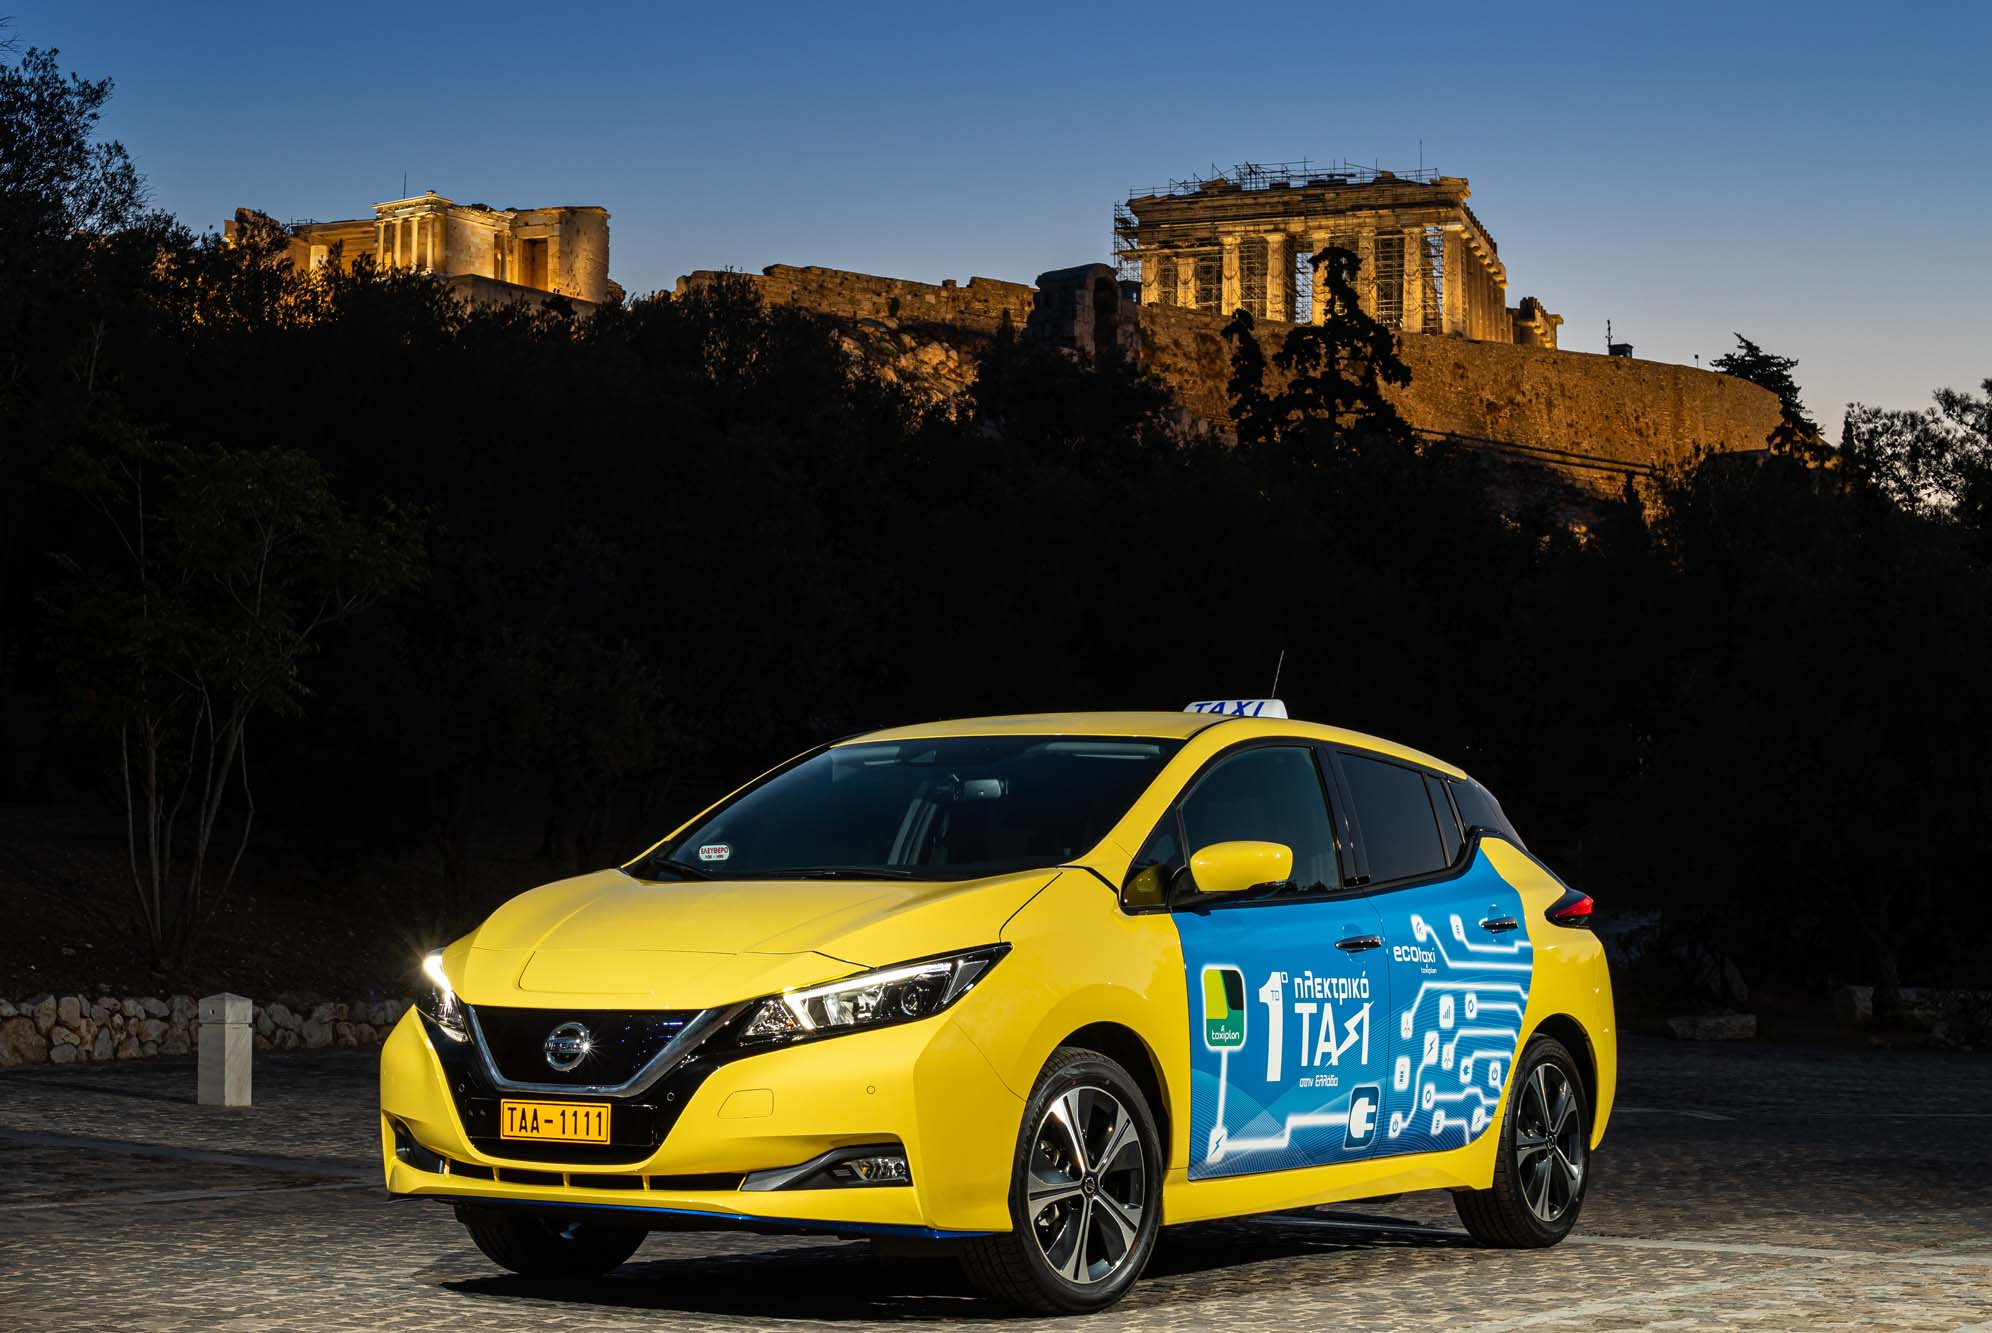 Nissan και Taxiplon κυκλοφορούν το πρώτο αμιγώς ηλεκτρικό ταξί στην Ελλάδα!